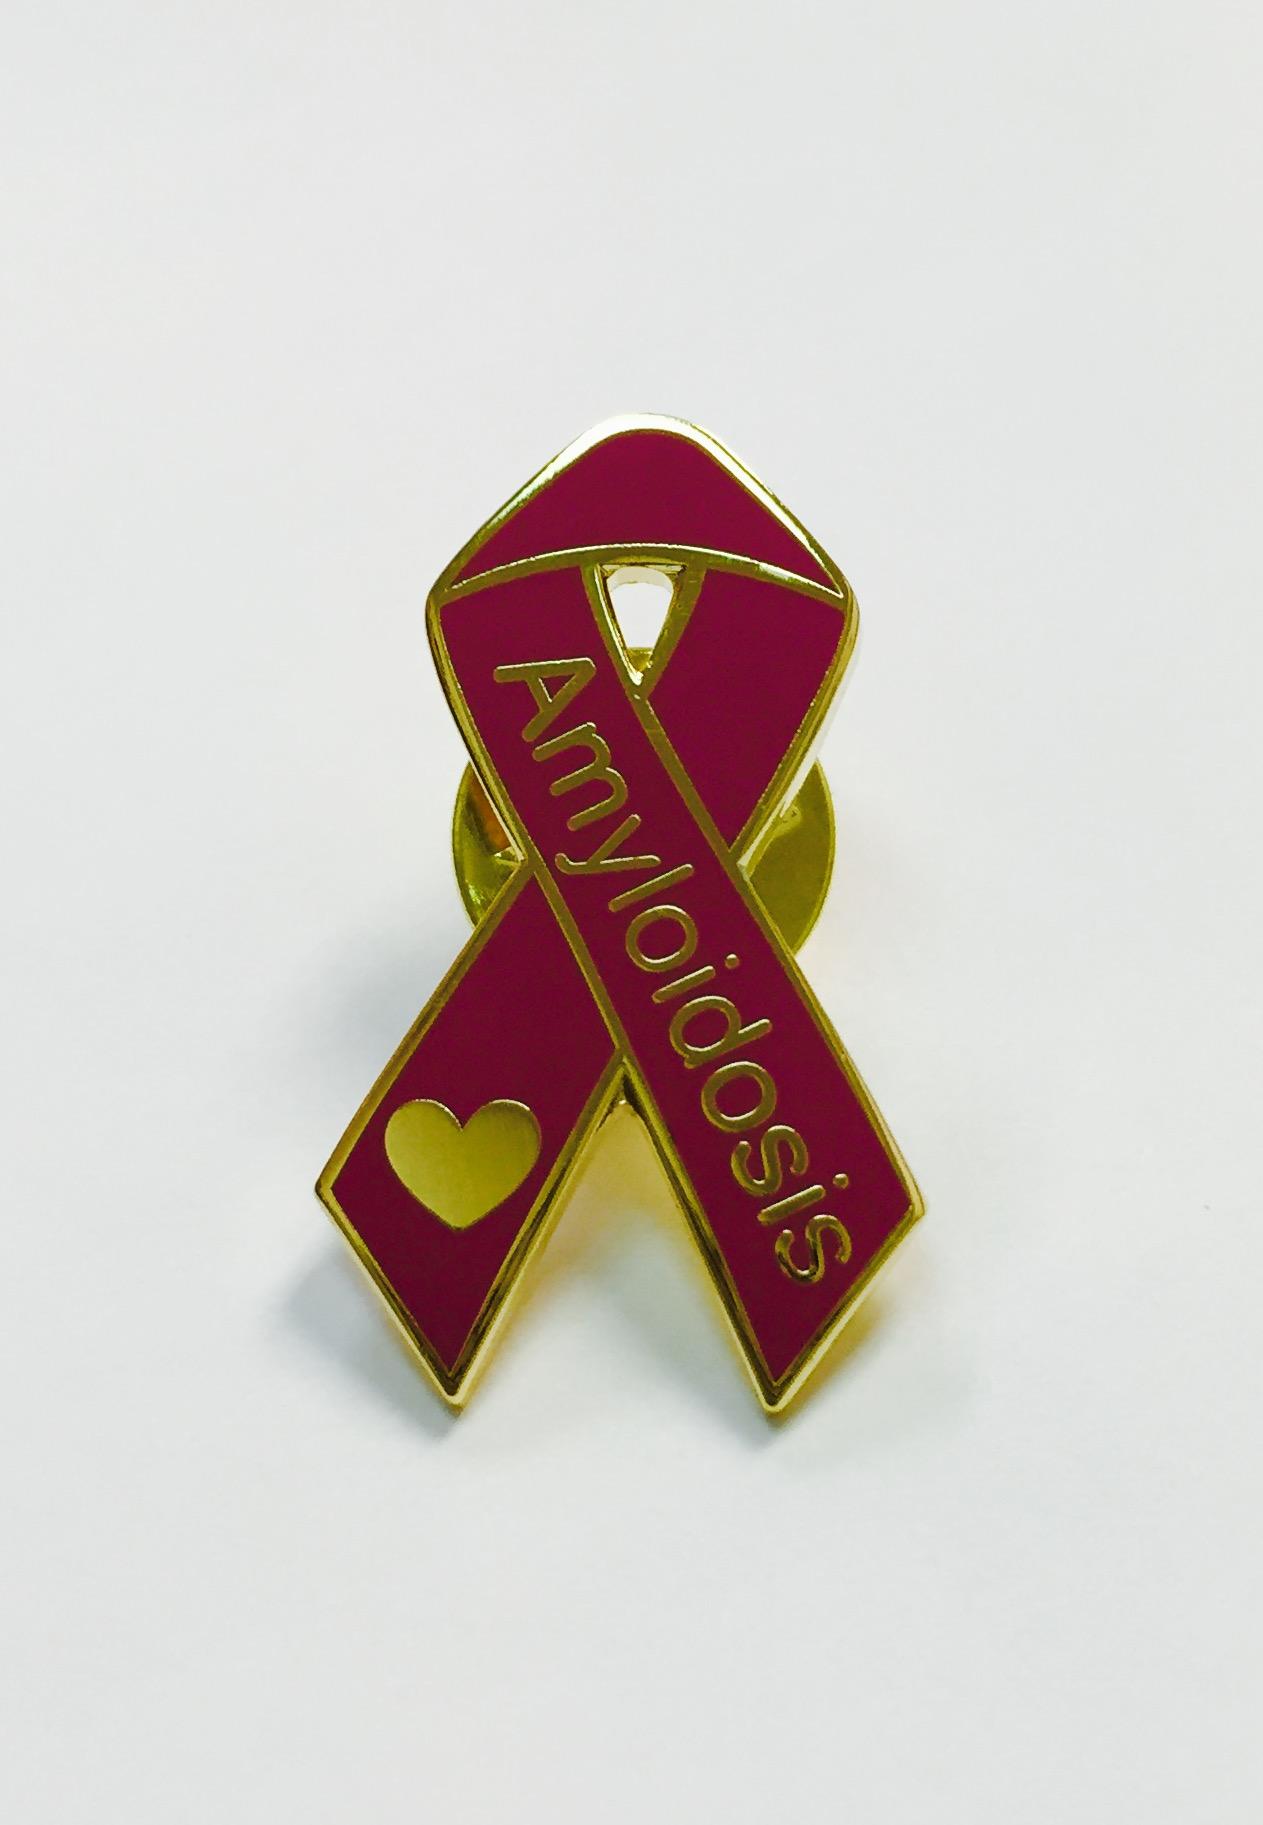 Ribbon Awareness Pin - Amyloidosis Foundation